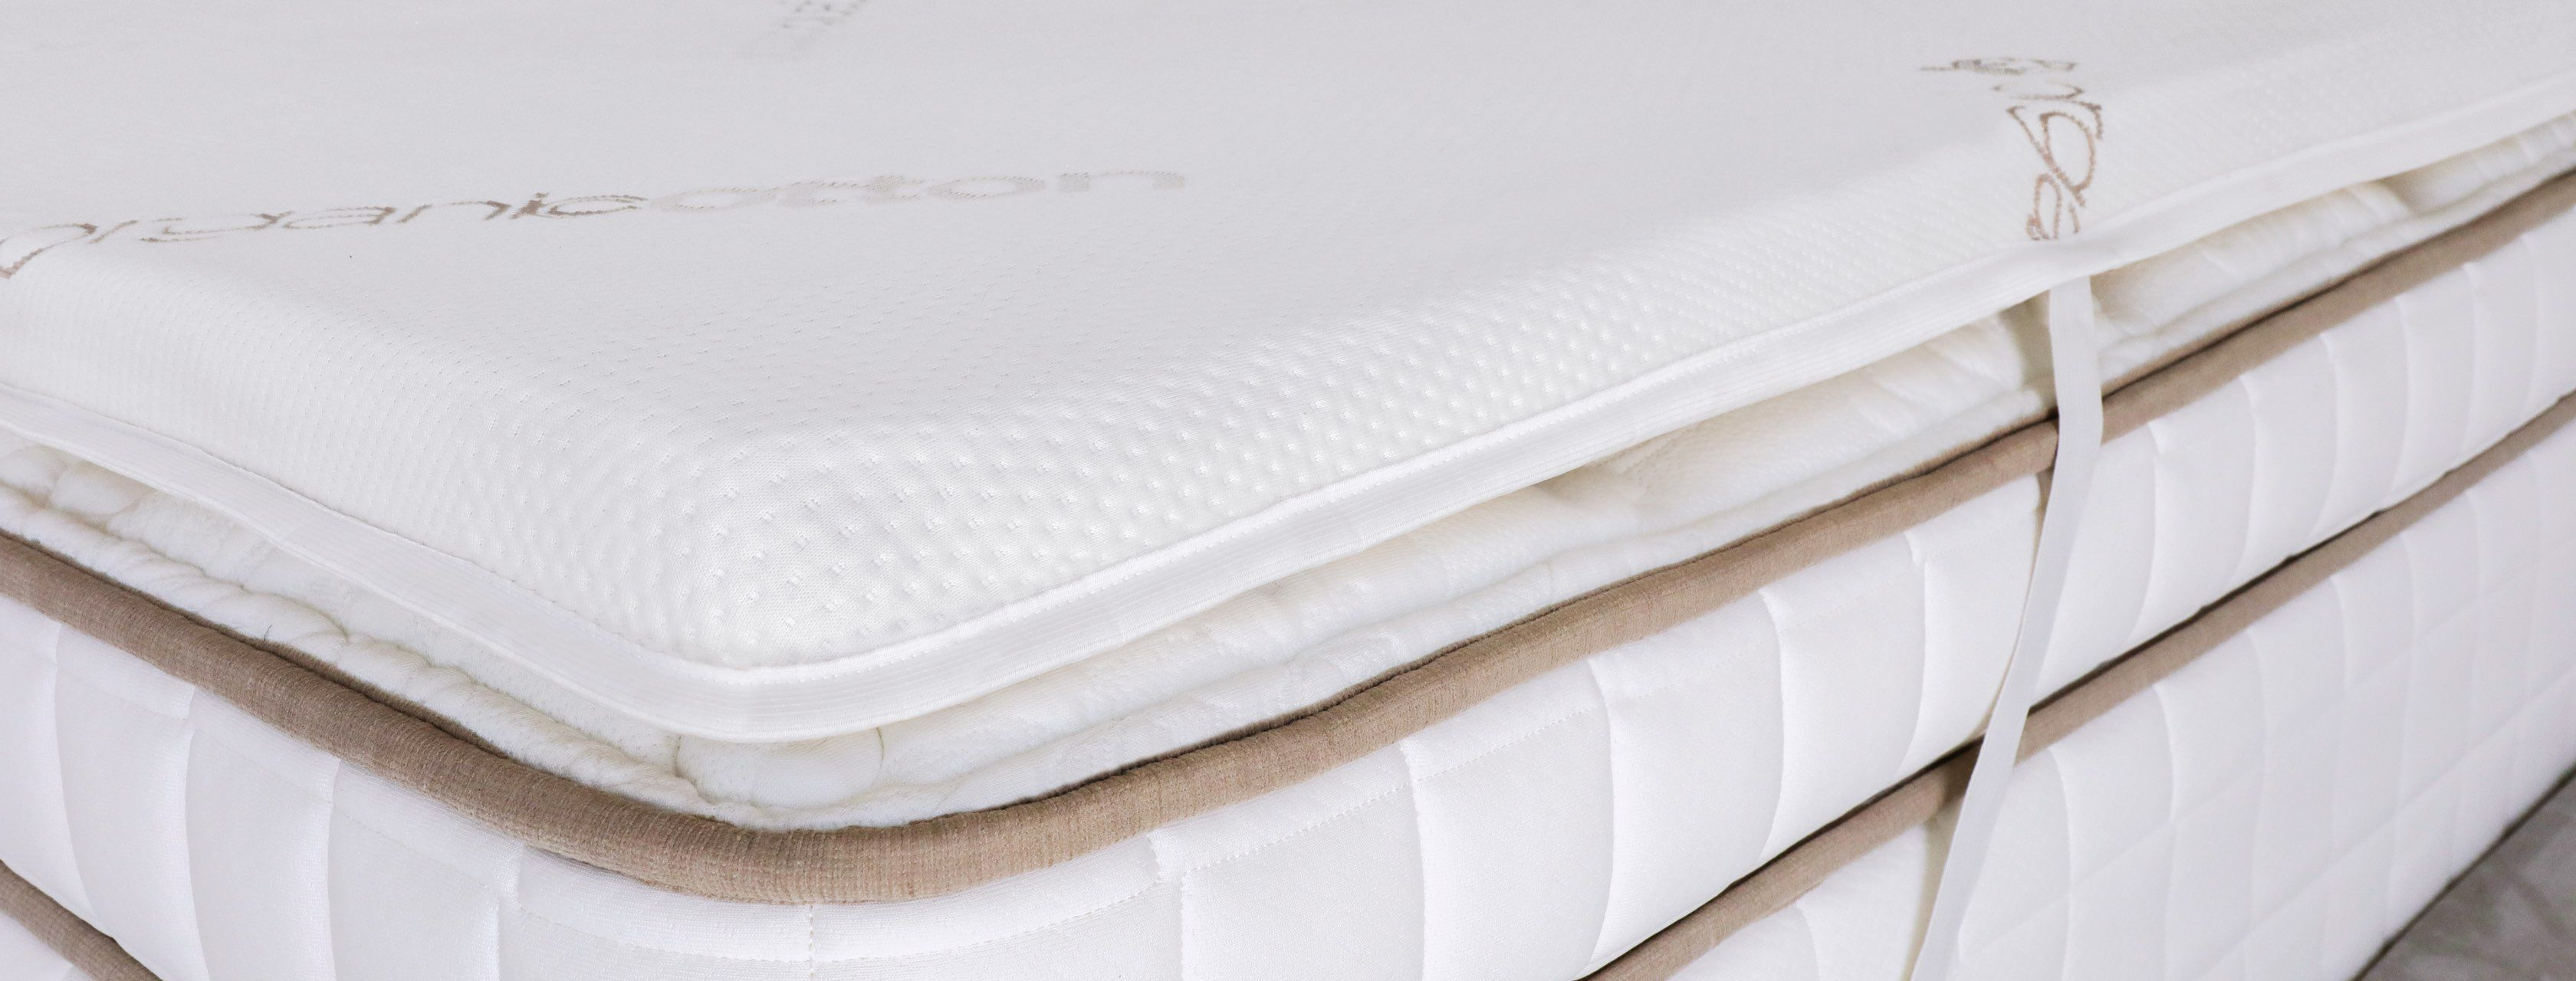 Luxury Cooling Graphite Memory Foam Topper Queen In 2020